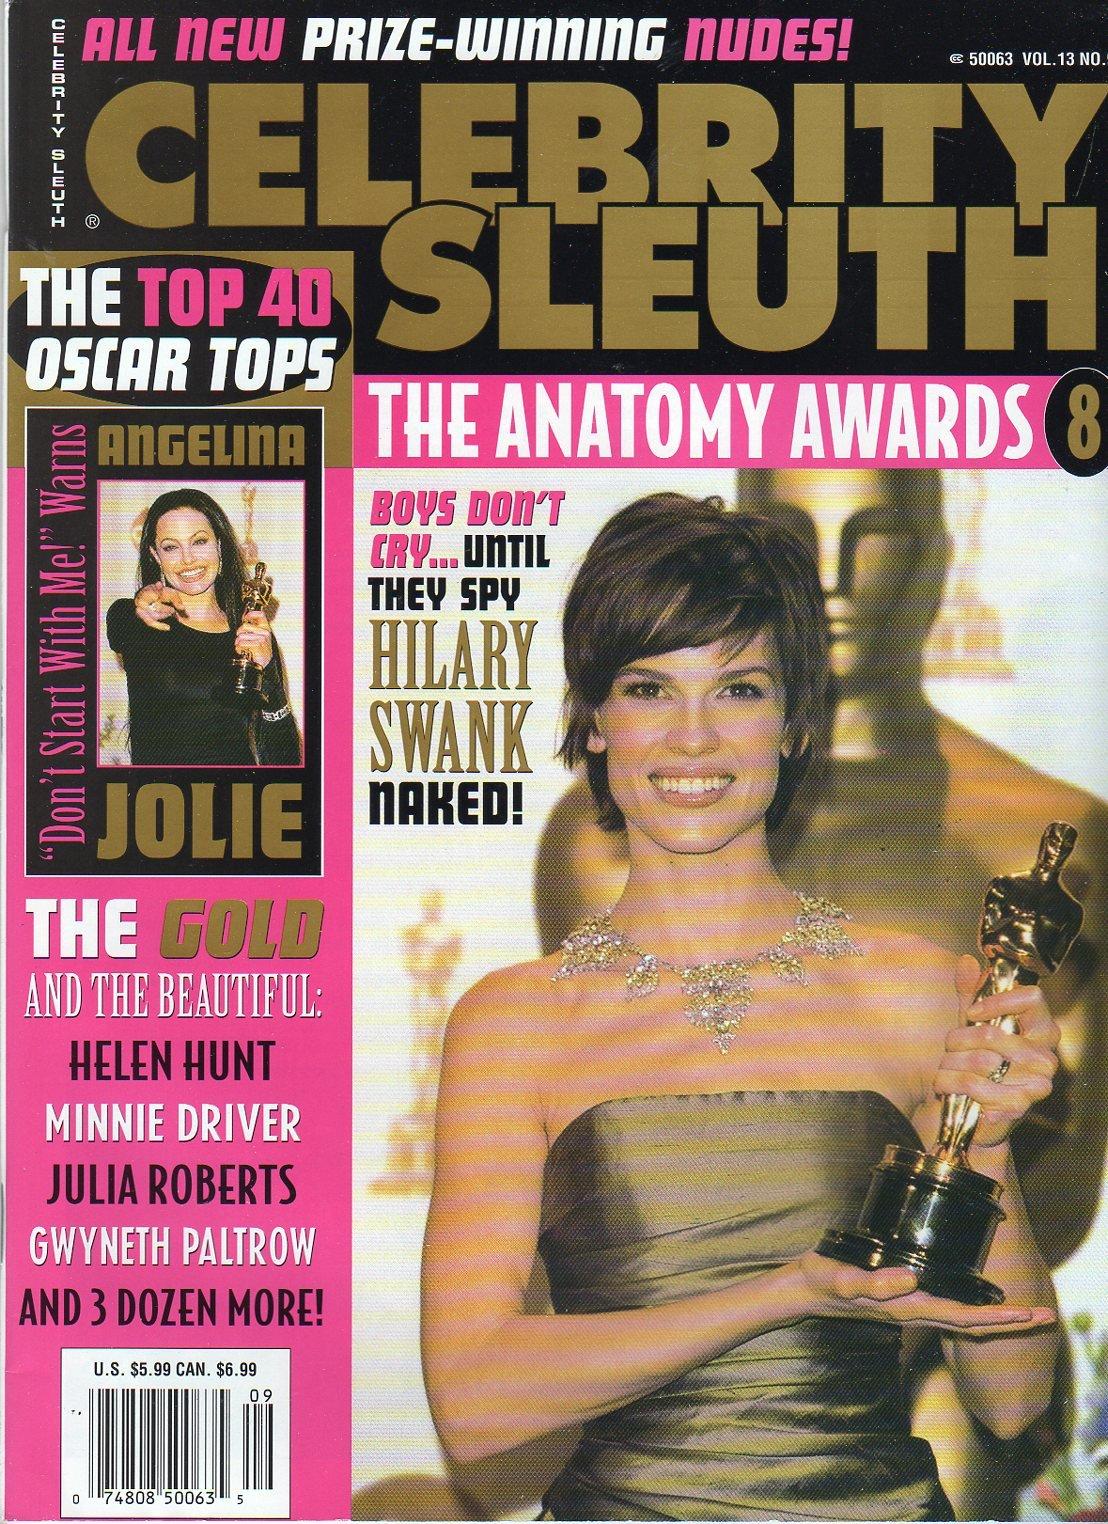 Celebrity Sleuth Vol 13 Number 9 The Anatomy Awards Hilary Swank